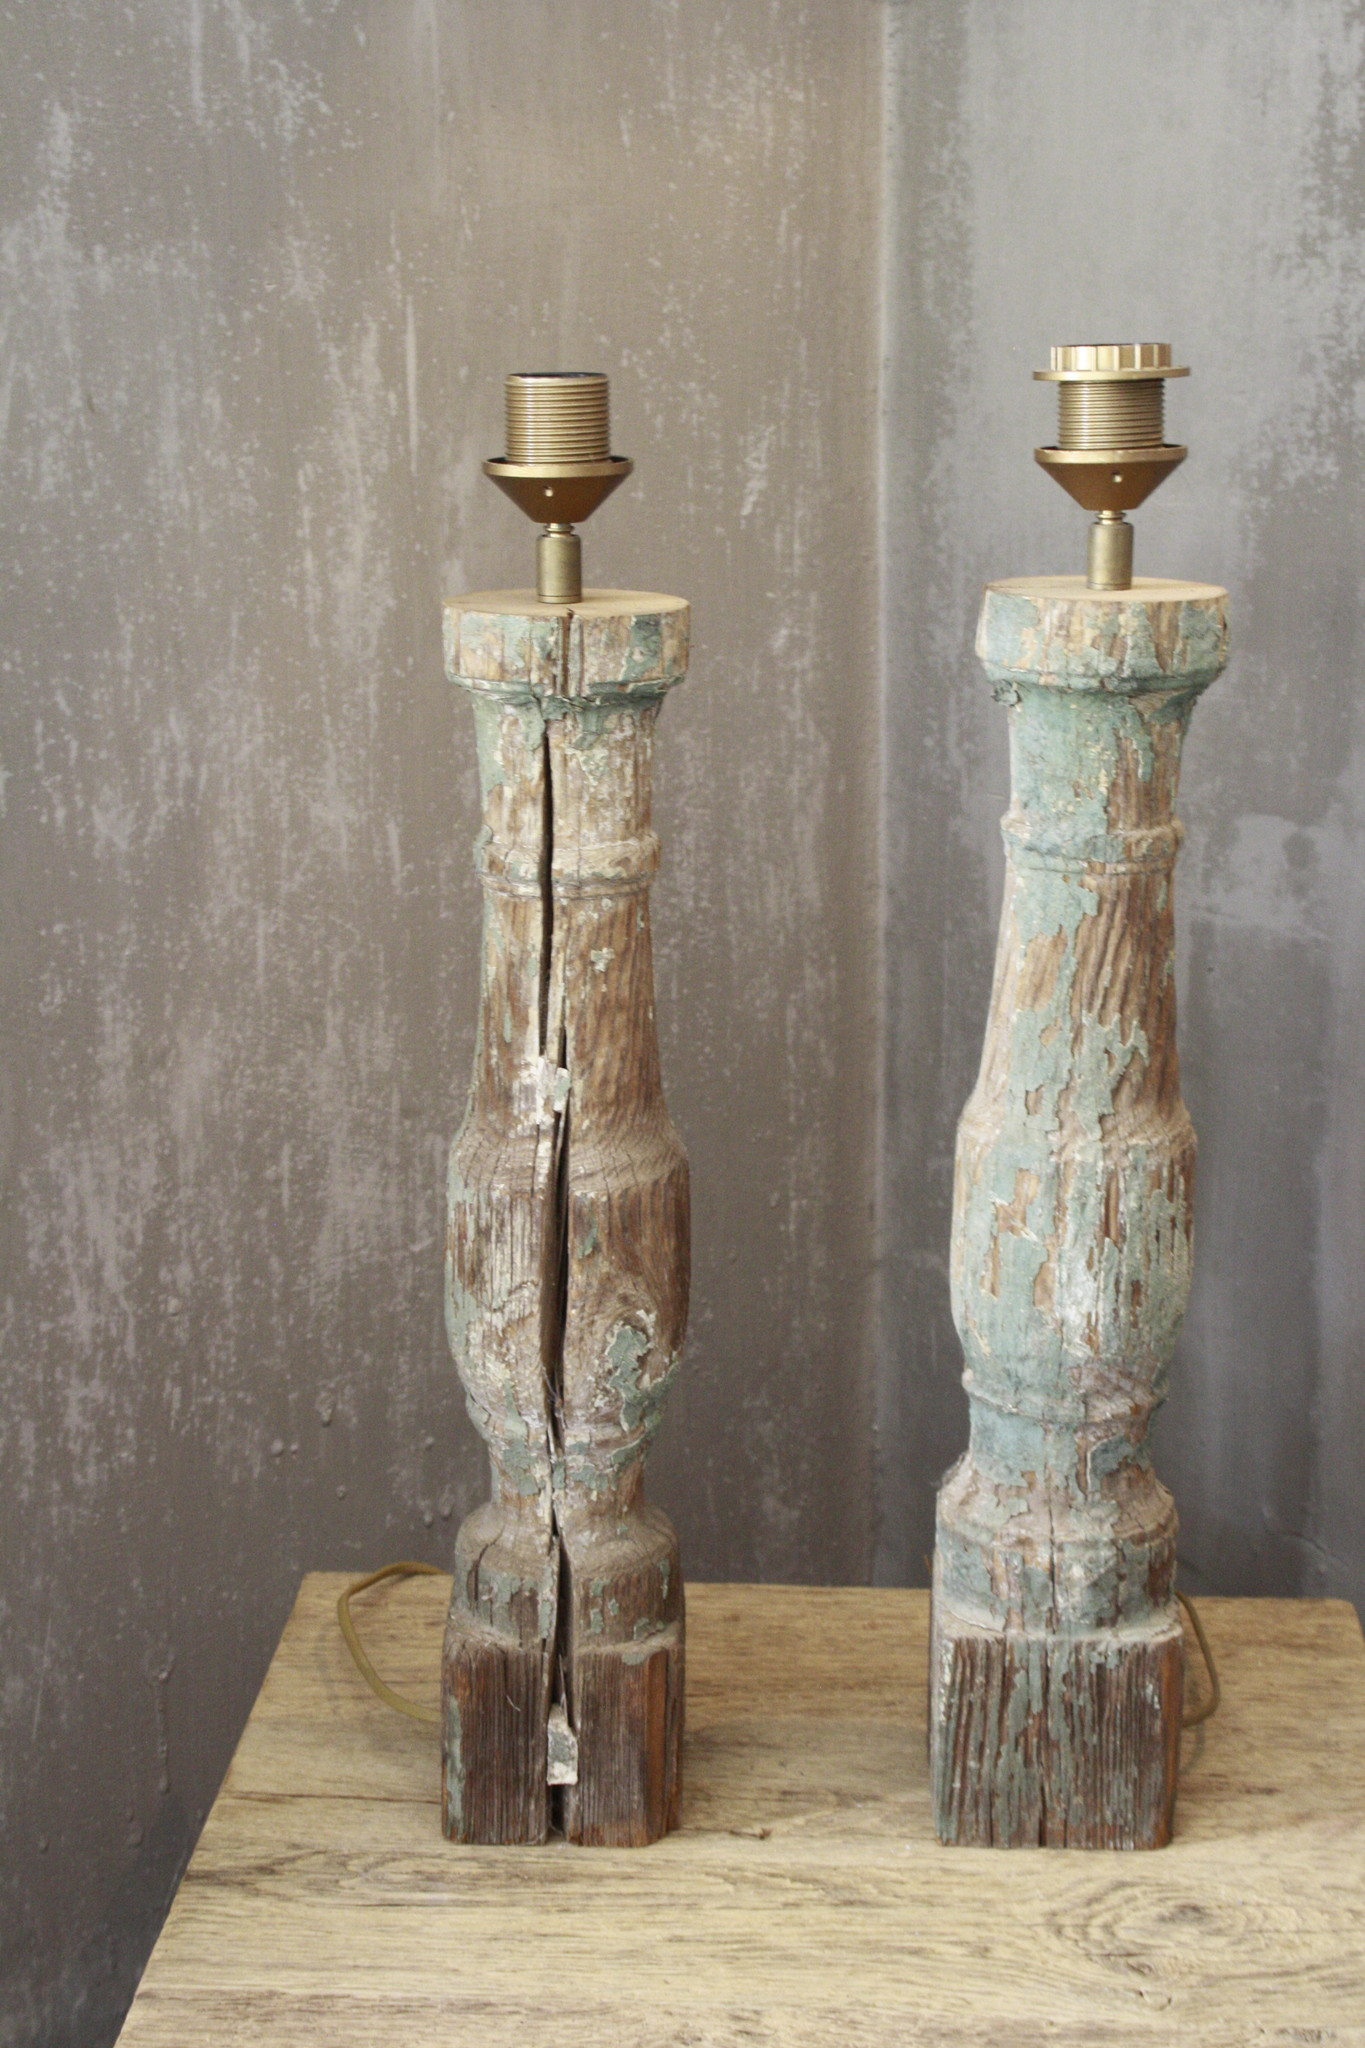 SET 2x Balusterlamp Oud Hout Groen tint 60 cm-1